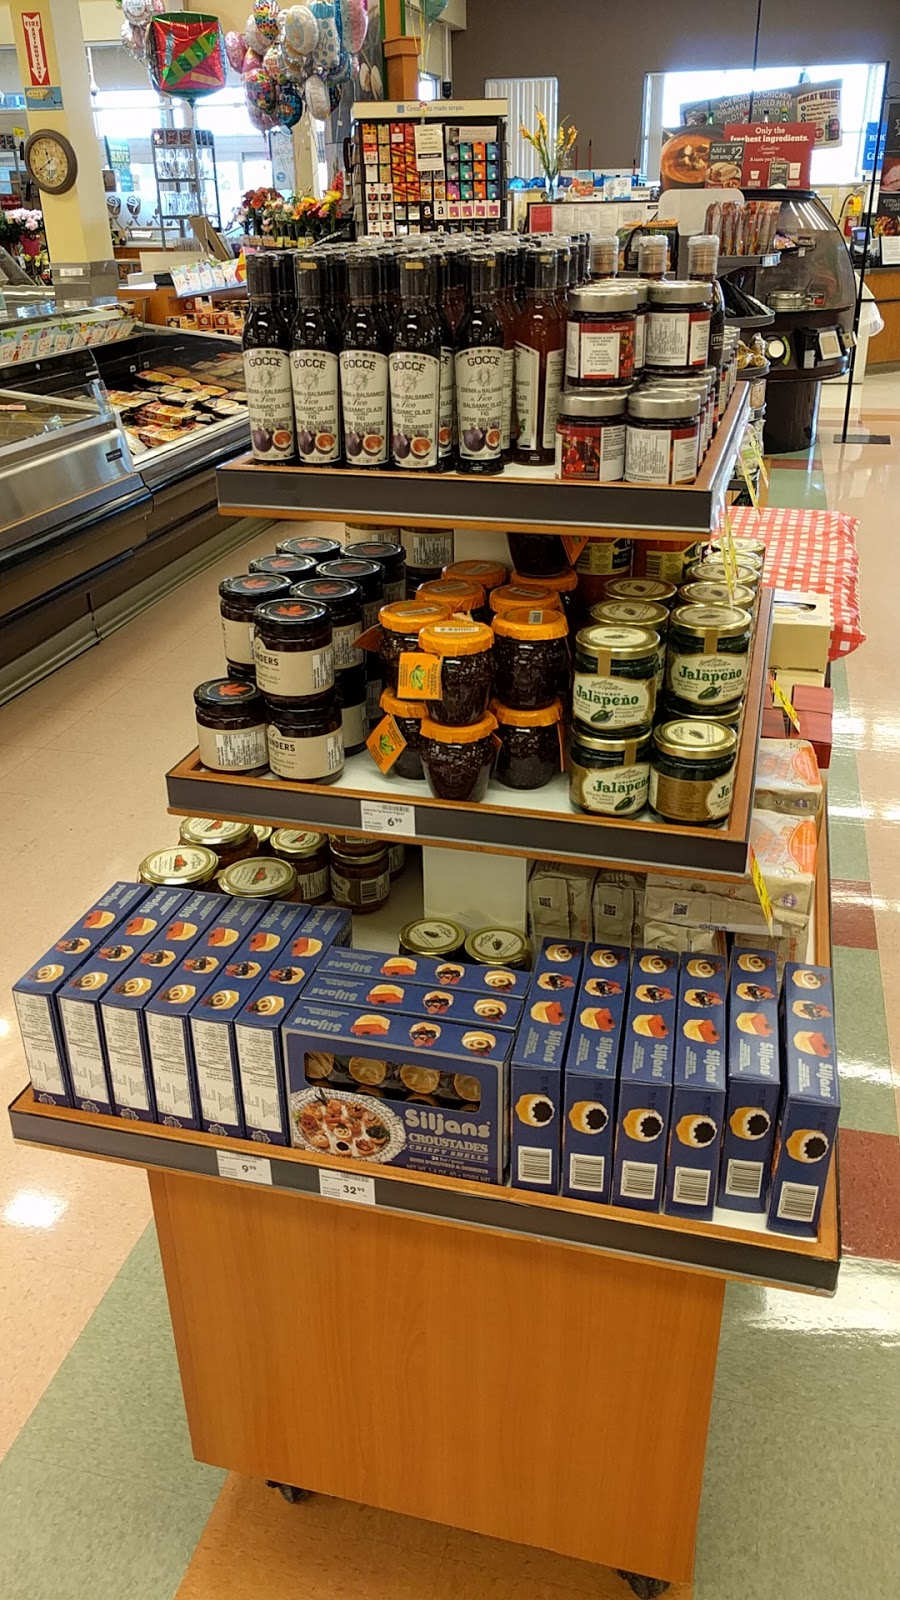 Sobeys - Preston Crossing | bakery | 1739 Preston Ave N, Saskatoon, SK S7N 4V2, Canada | 3066689901 OR +1 306-668-9901